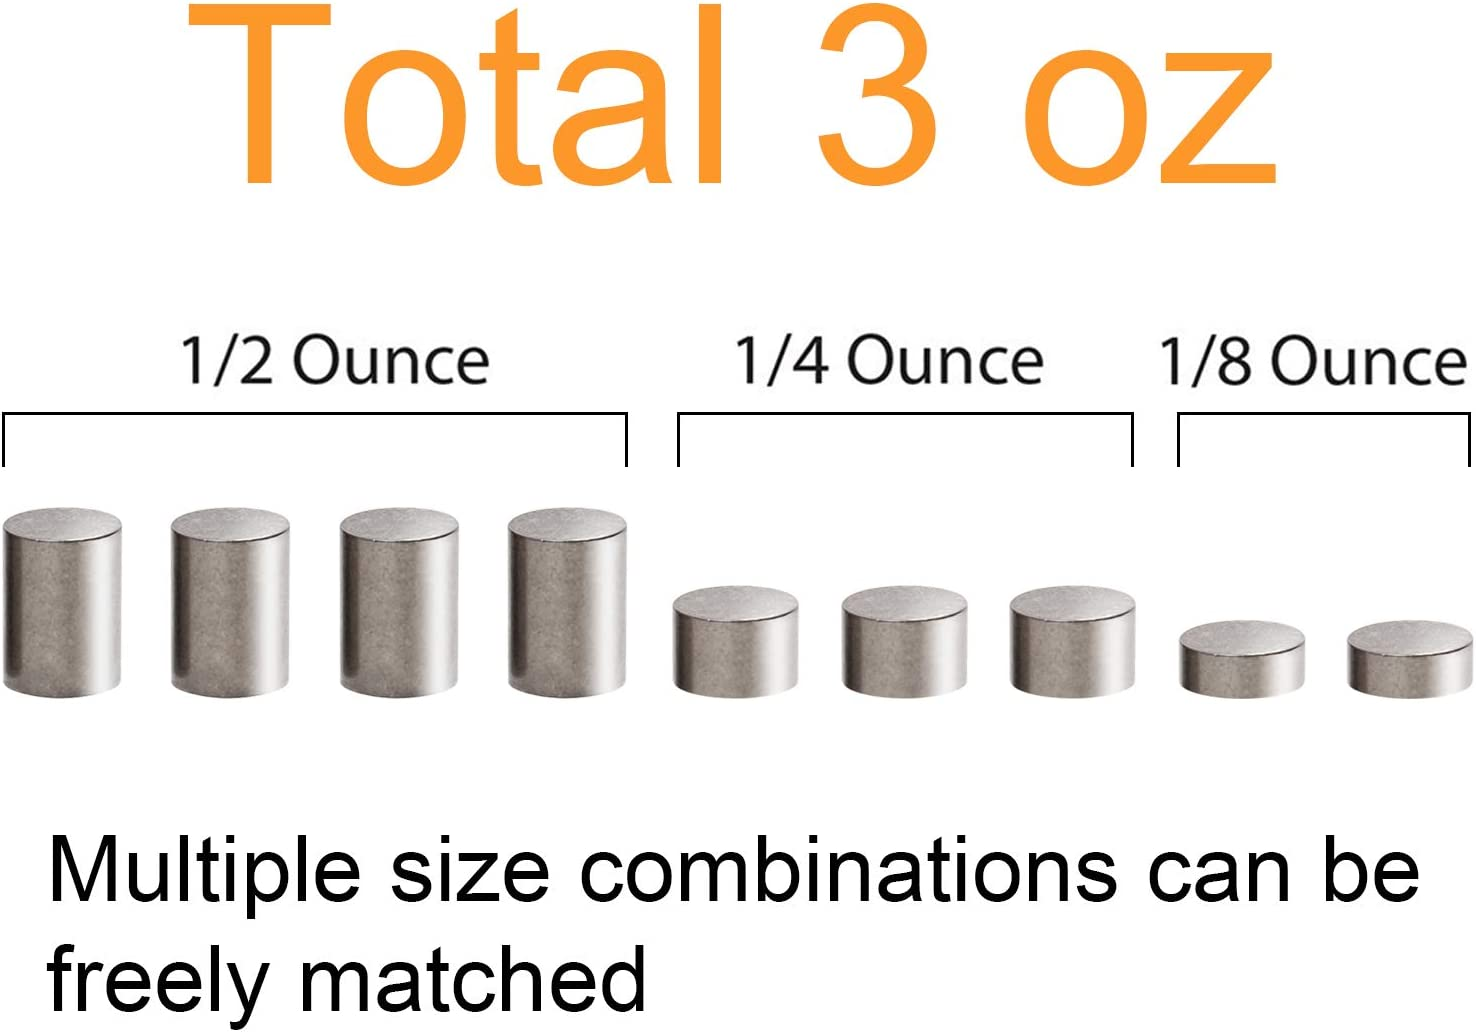 Ruisita 3 Ounce Pinewood Derby Weights Tungsten Pinewood Derby Car Weights Cylinders Weights in 3 Sizes 3 Ounces